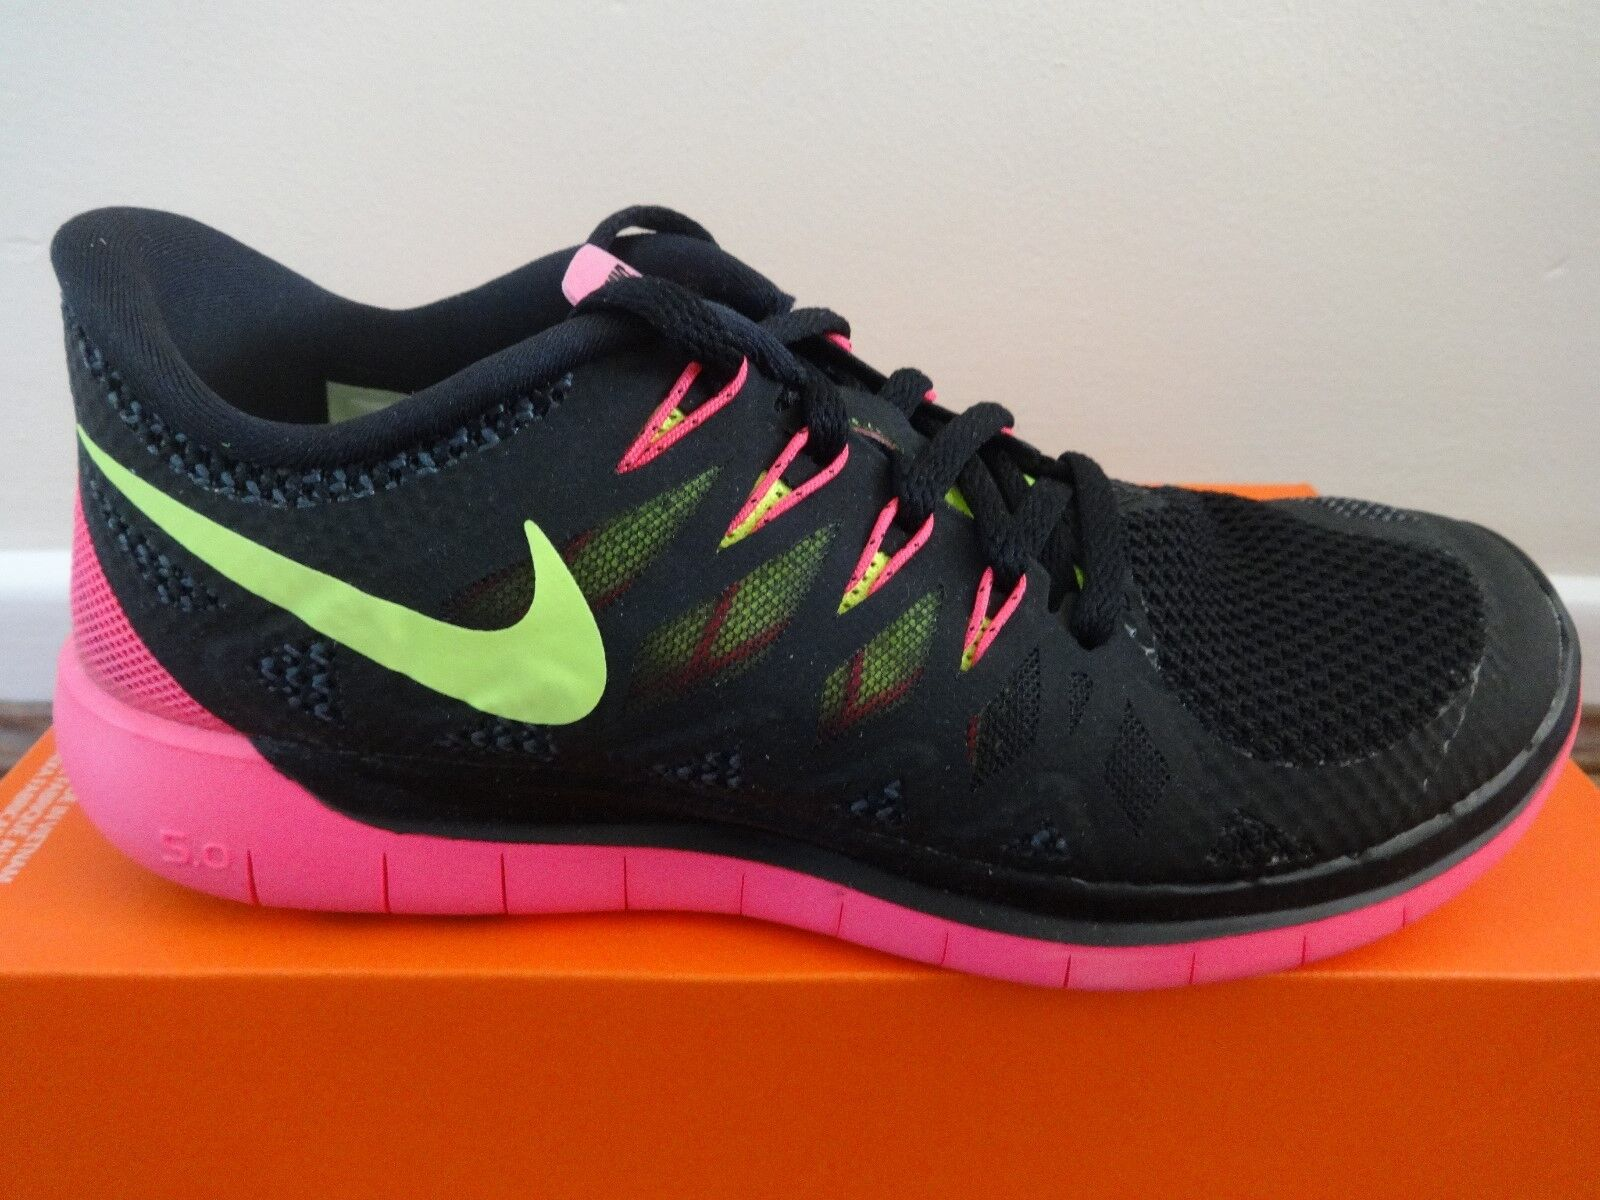 Nike Free 5.0 Damenss trainers Turnschuhe schuhe 642199 002 us uk 4.5 eu 38 us 002 7 NEW 0d520c